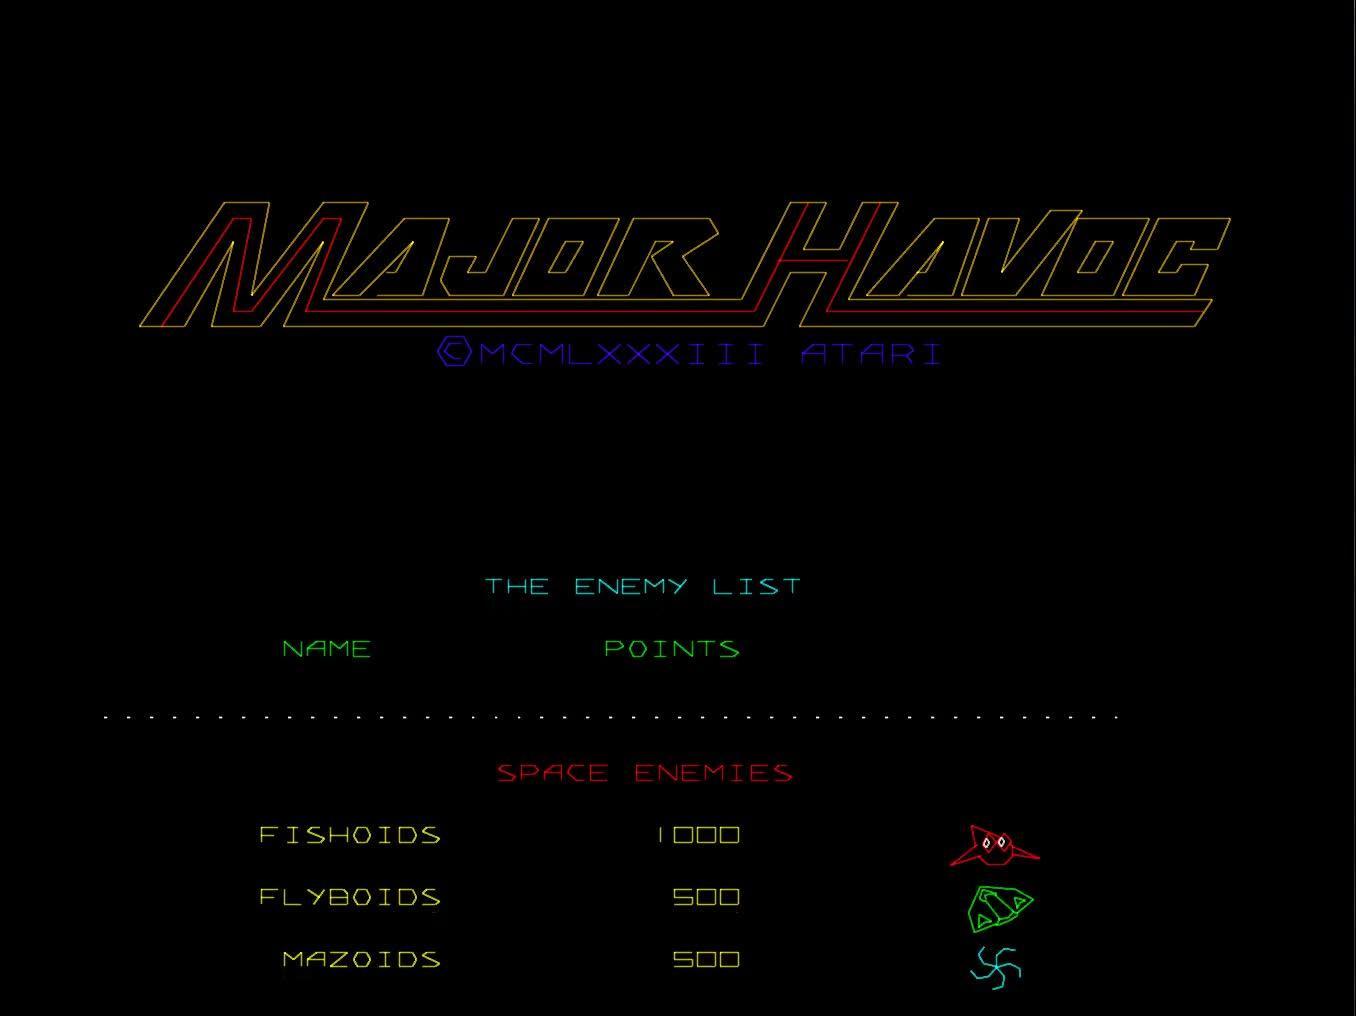 Arcade1UP - Atari Asteroids